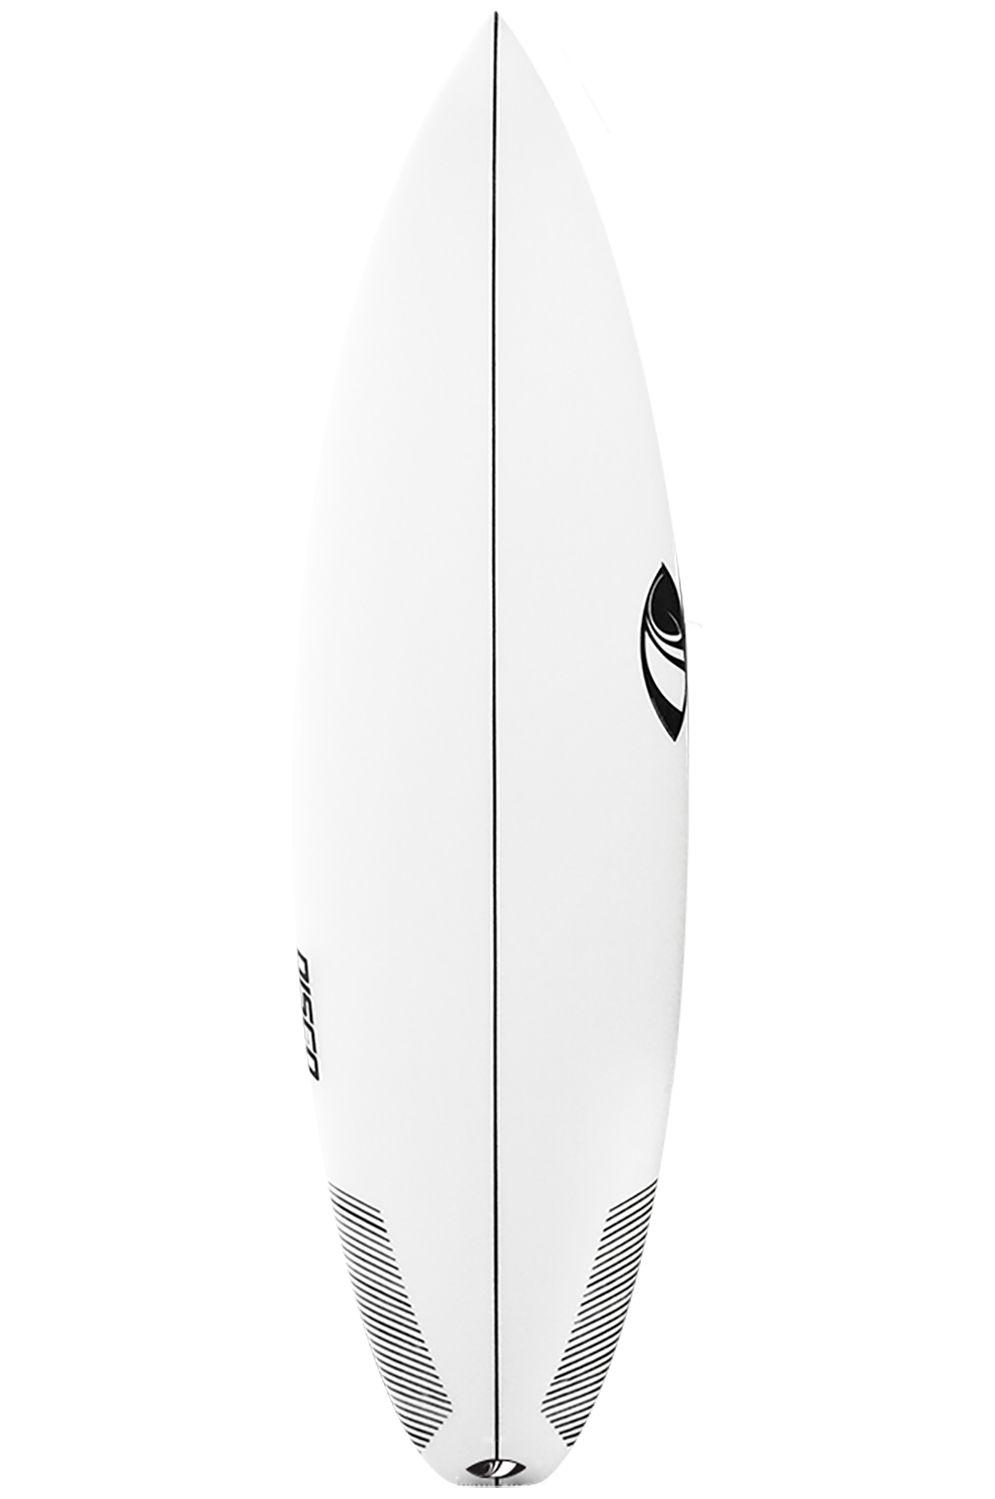 Prancha Surf Sharpeye DISCO 5'11 Squash Tail - White FCS II 5ft11